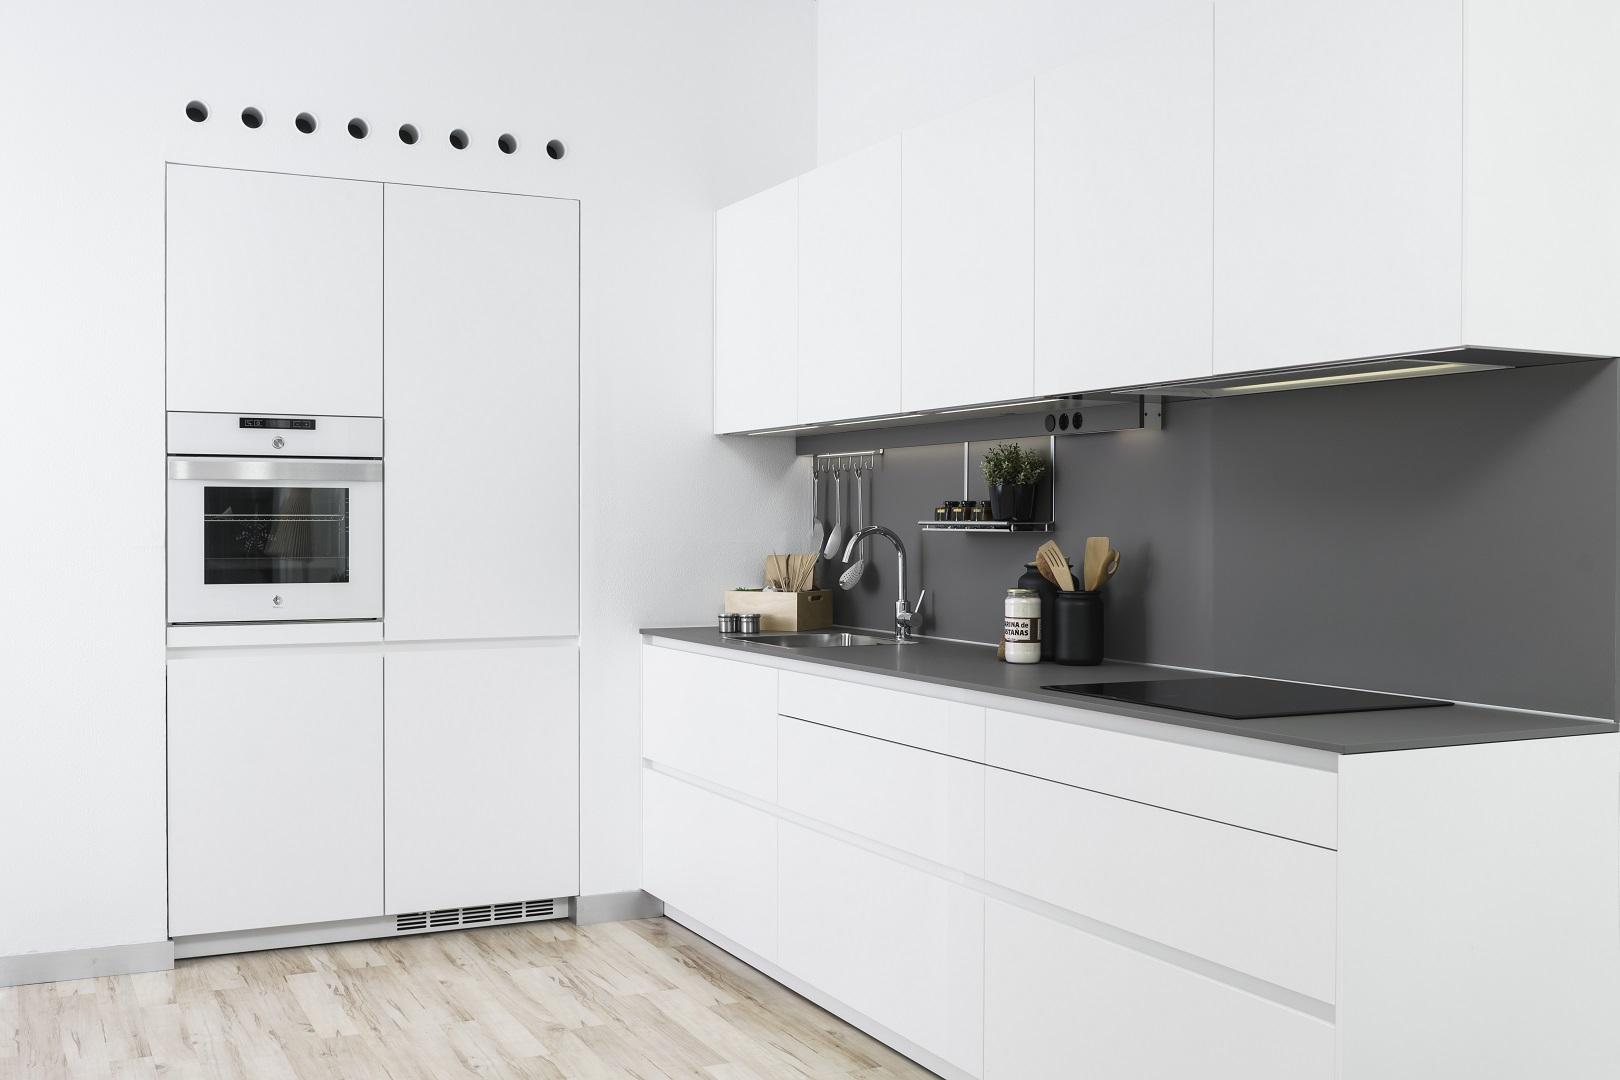 14 Ideas de Cocinas Blancas para Inspirarte  Santiago